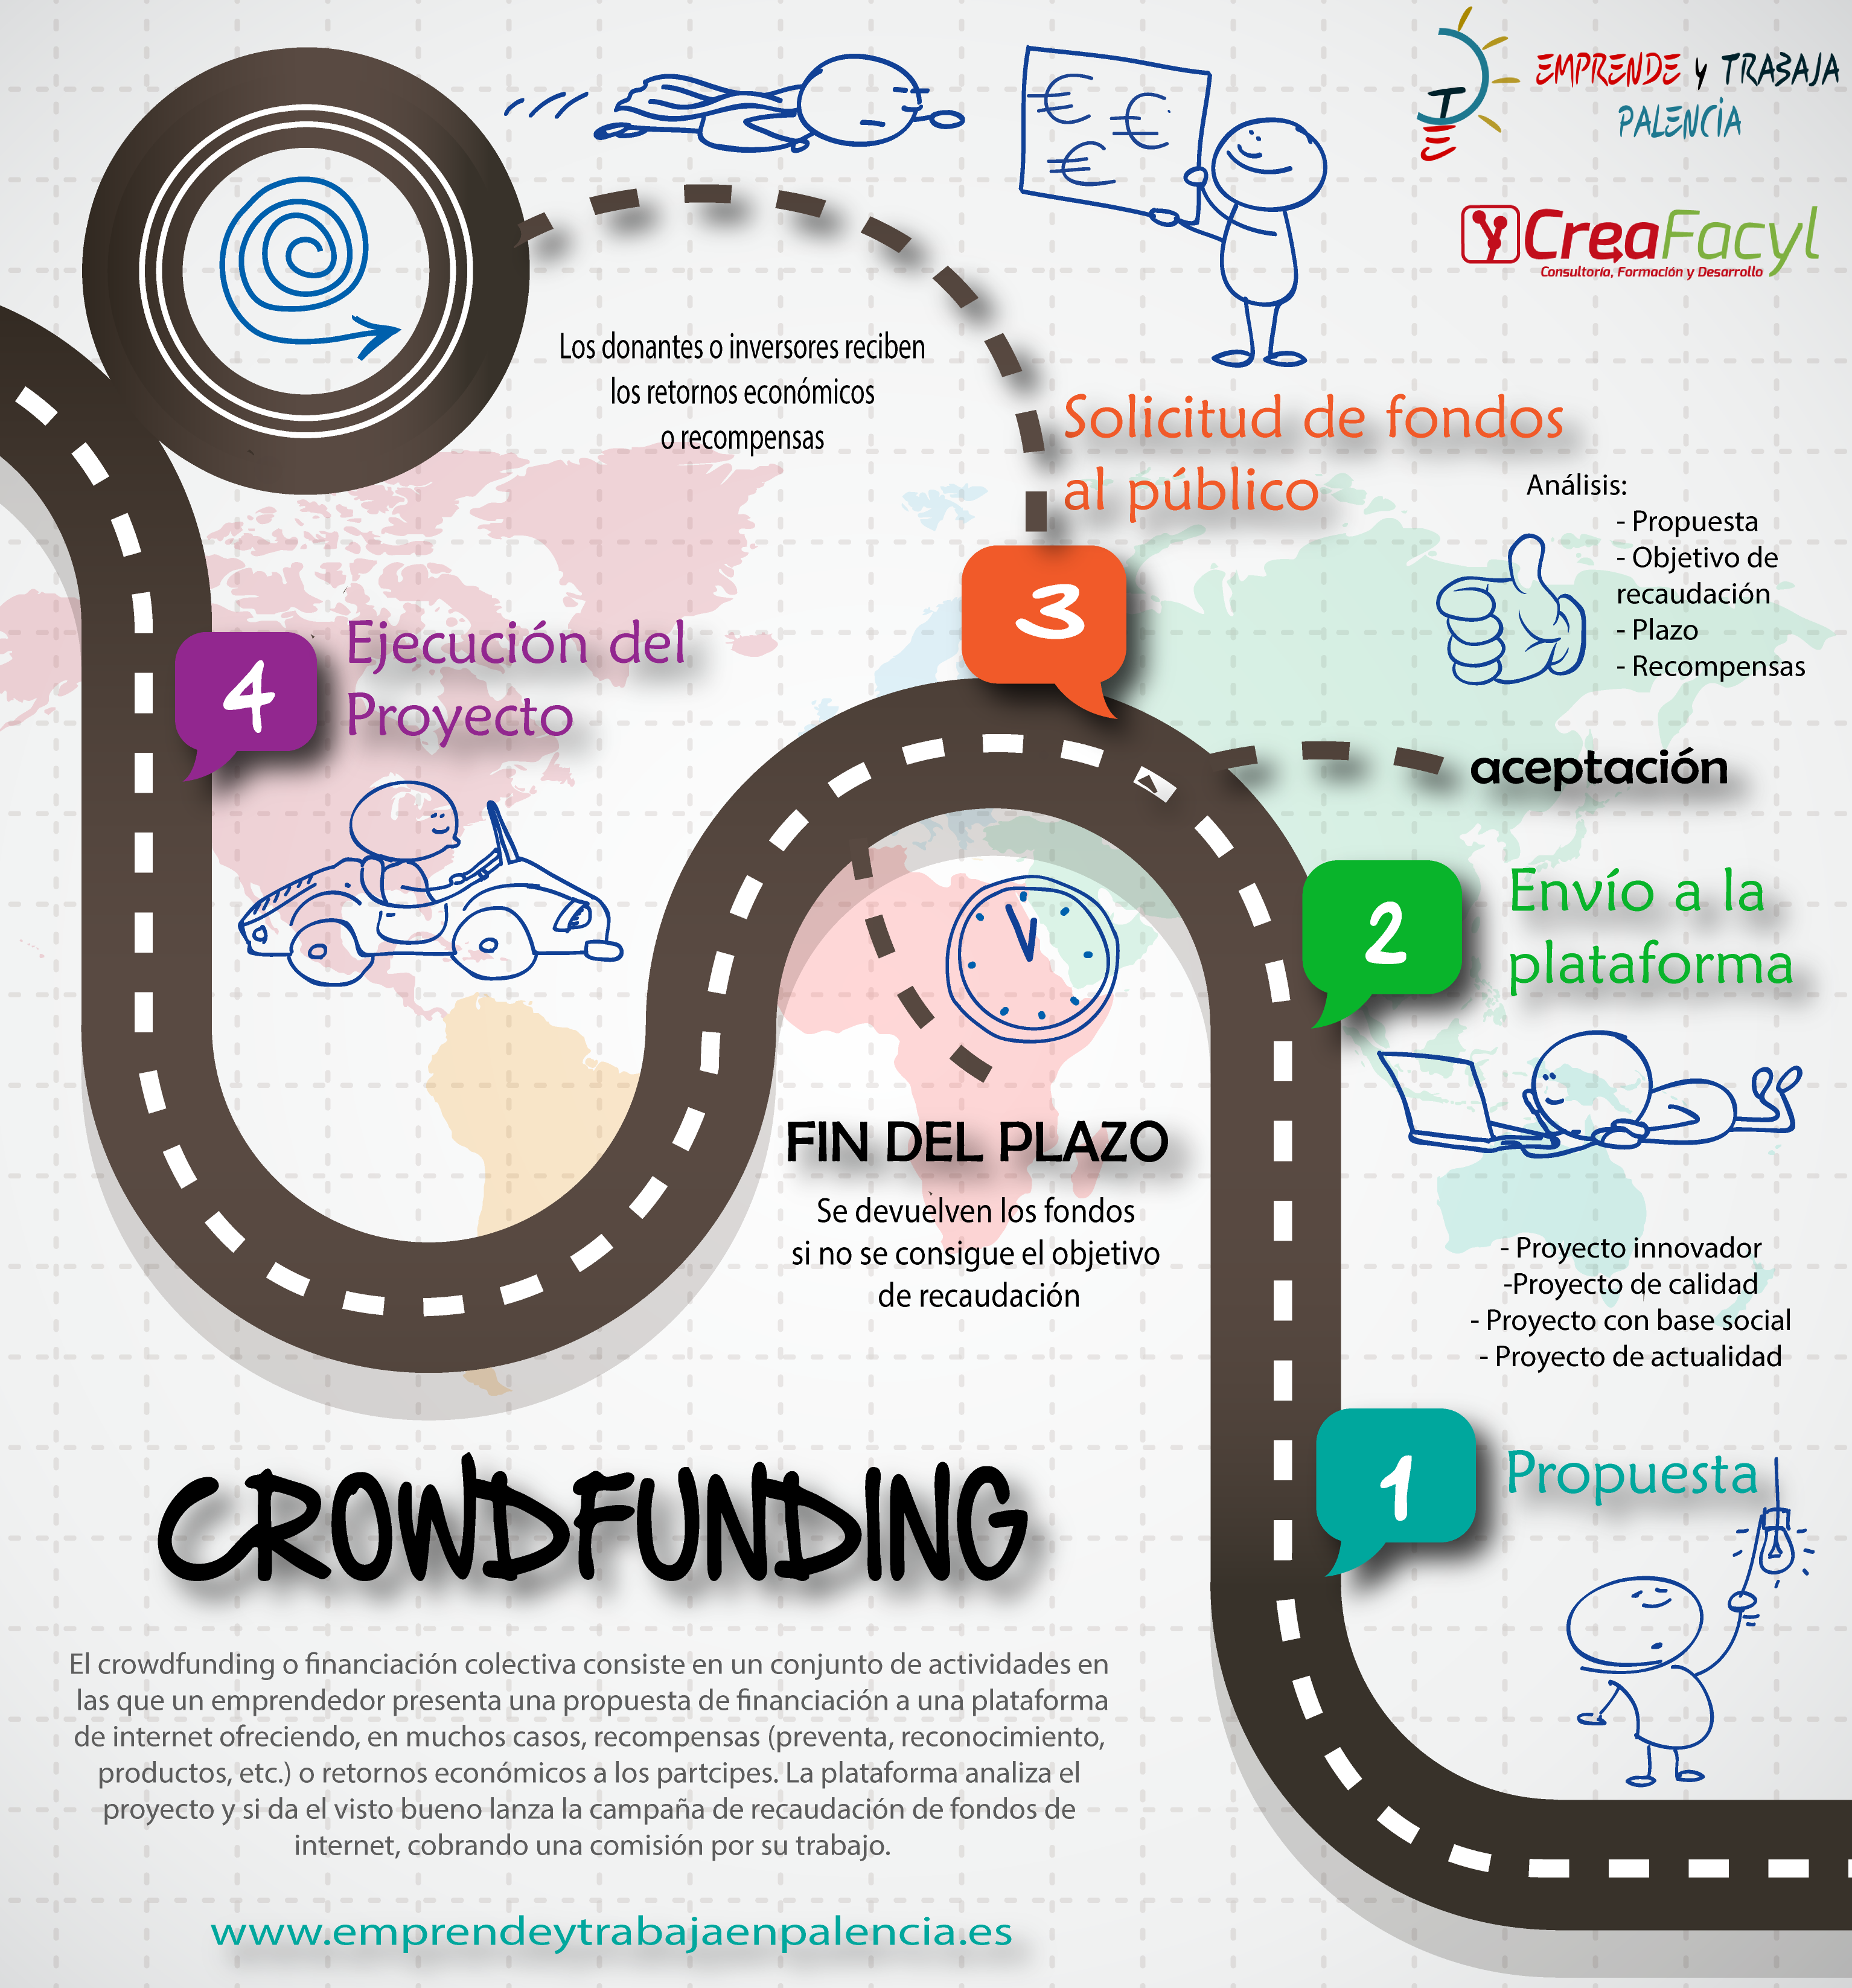 Crowdfunding Creafacyl